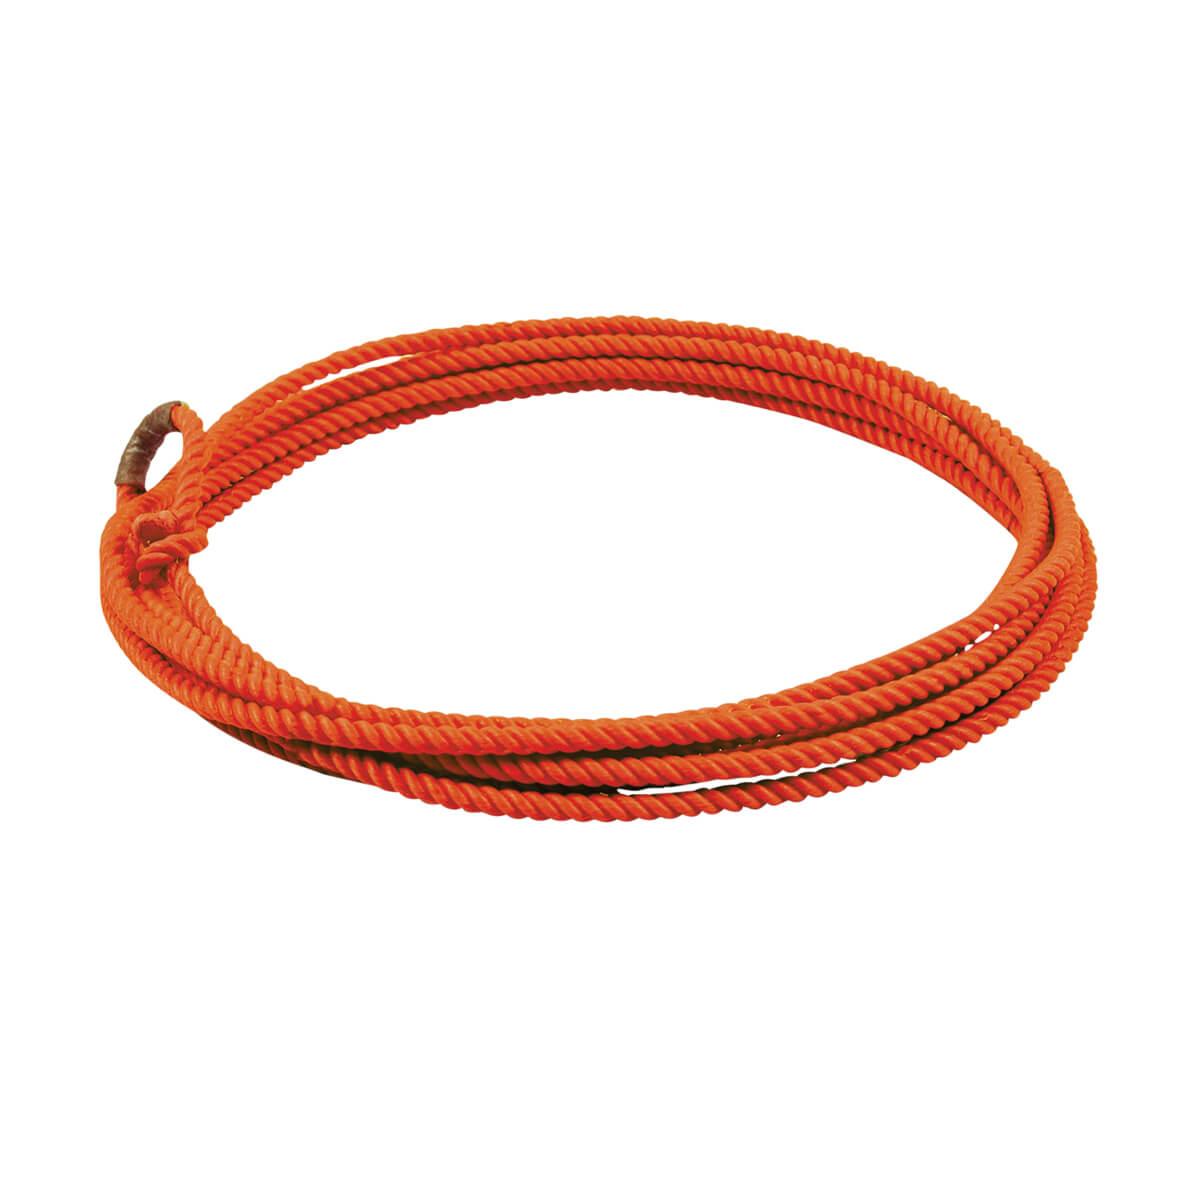 Little Looper Kids Rope - Orange - 23